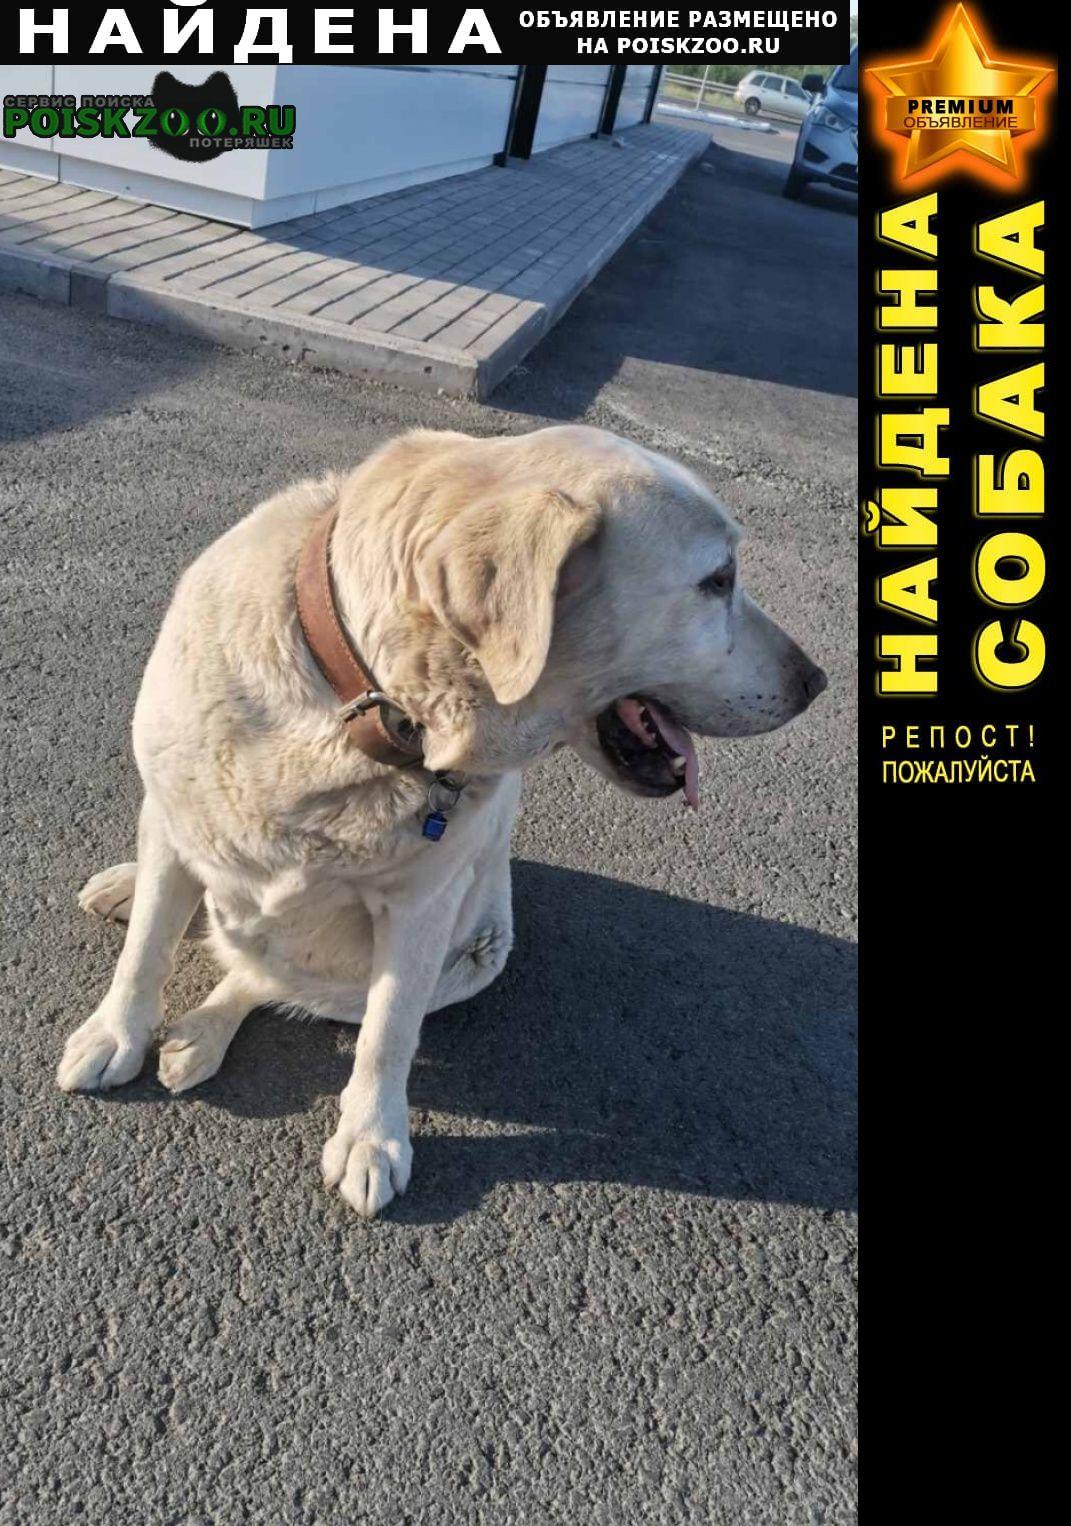 Найдена собака лабрадор Оренбург